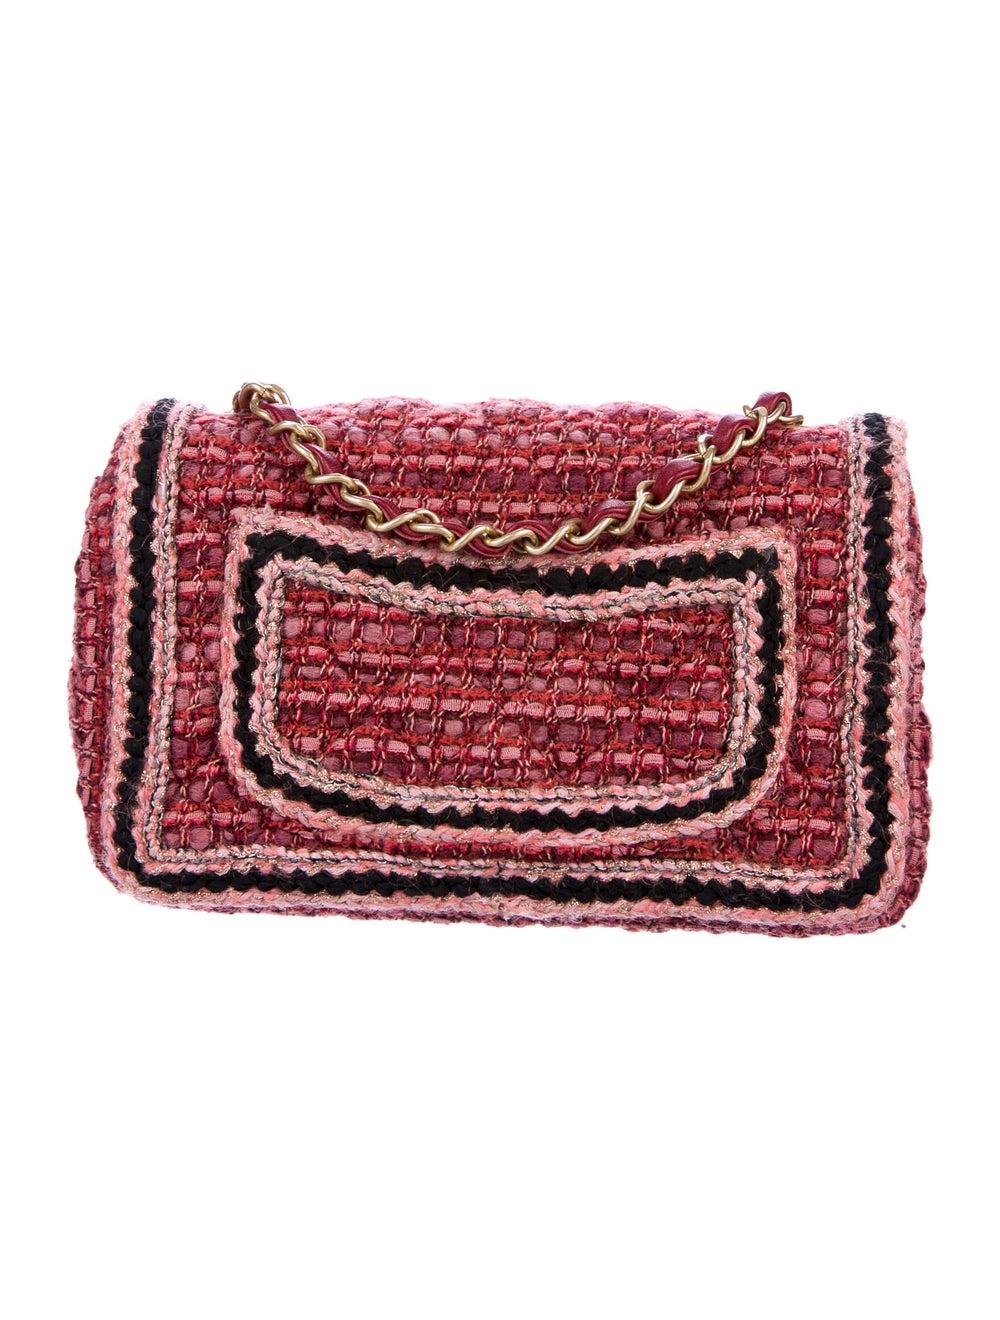 Chanel Tweed Braid Mini Flap Bag Red - image 4